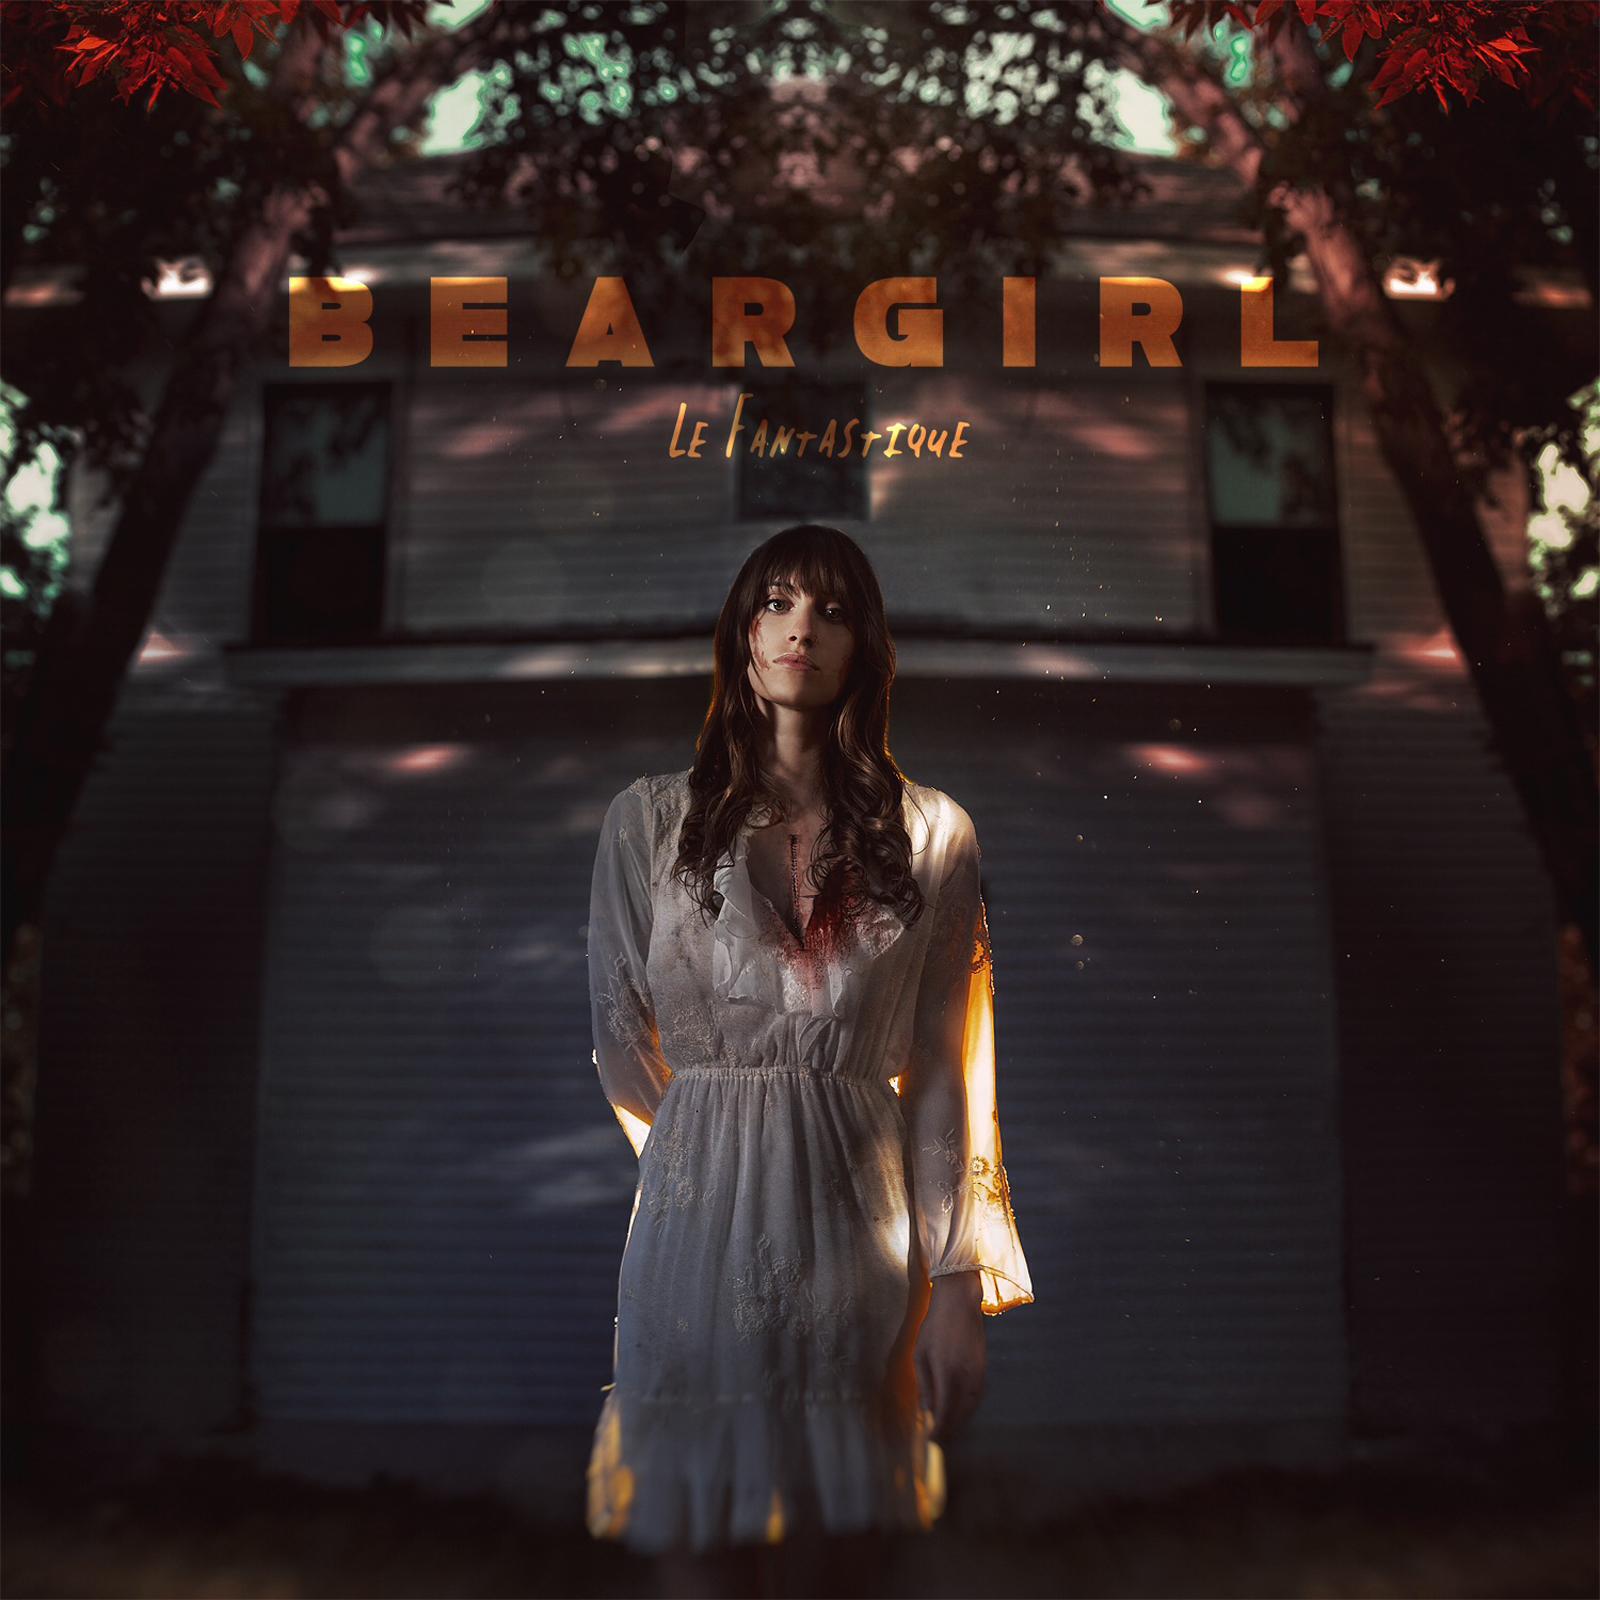 Bear Girl - 'Le Fantastique'